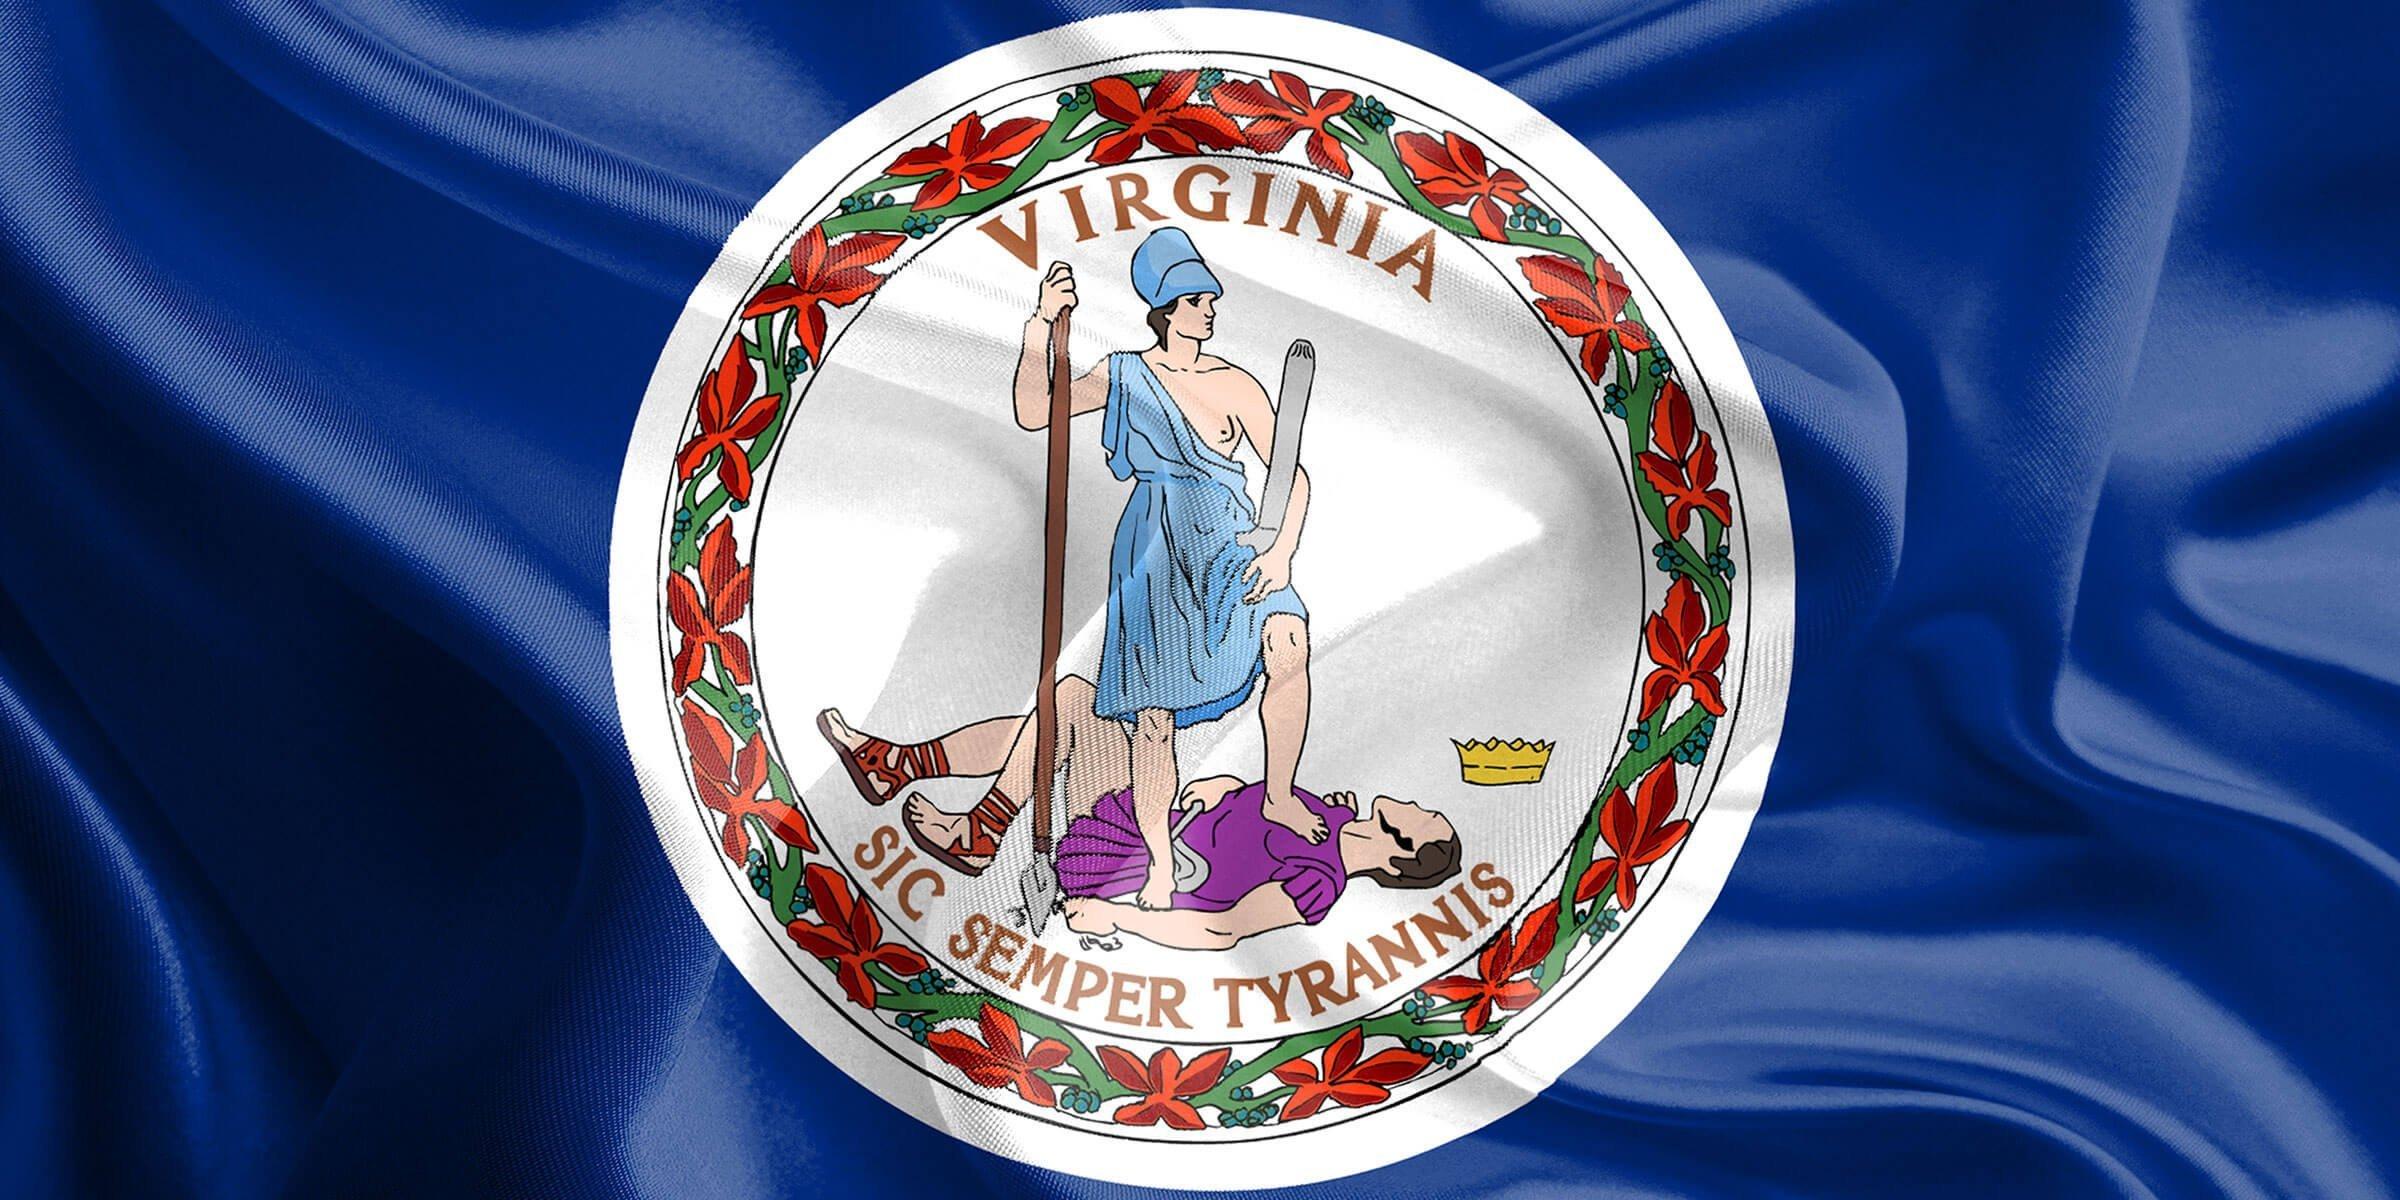 Virginia State Flag Detail